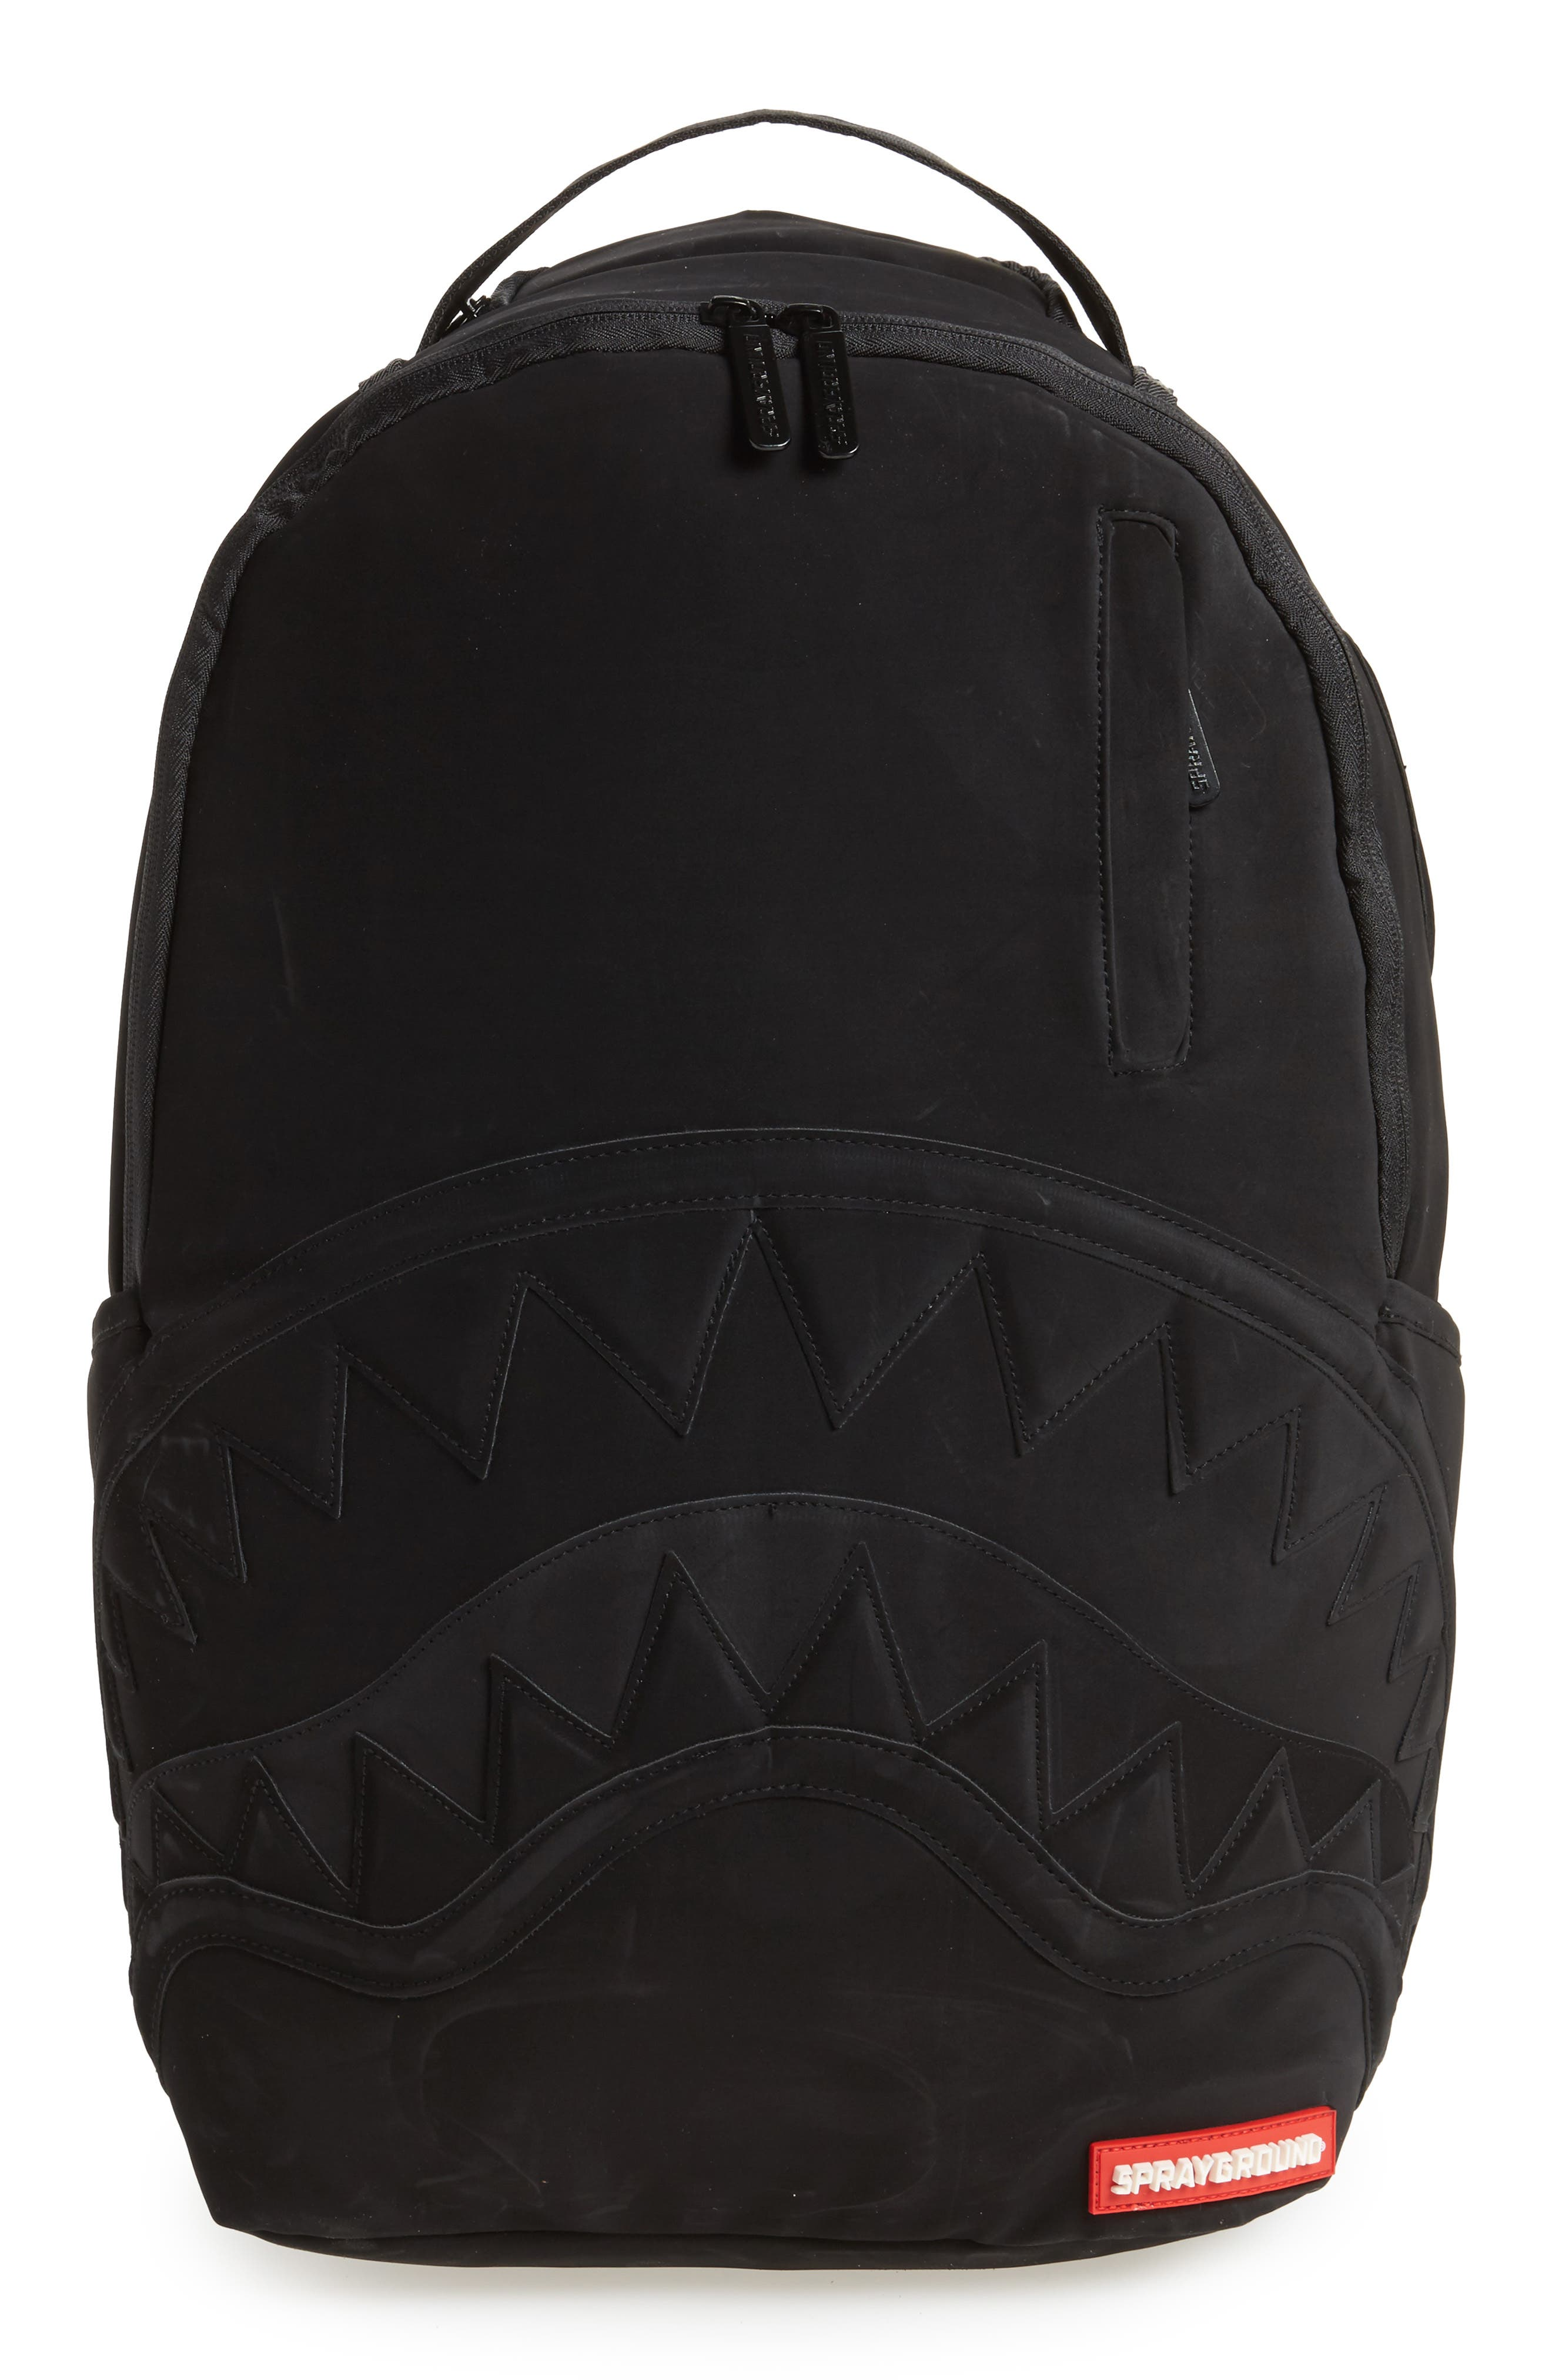 Ghost Shark Backpack,                         Main,                         color, Black